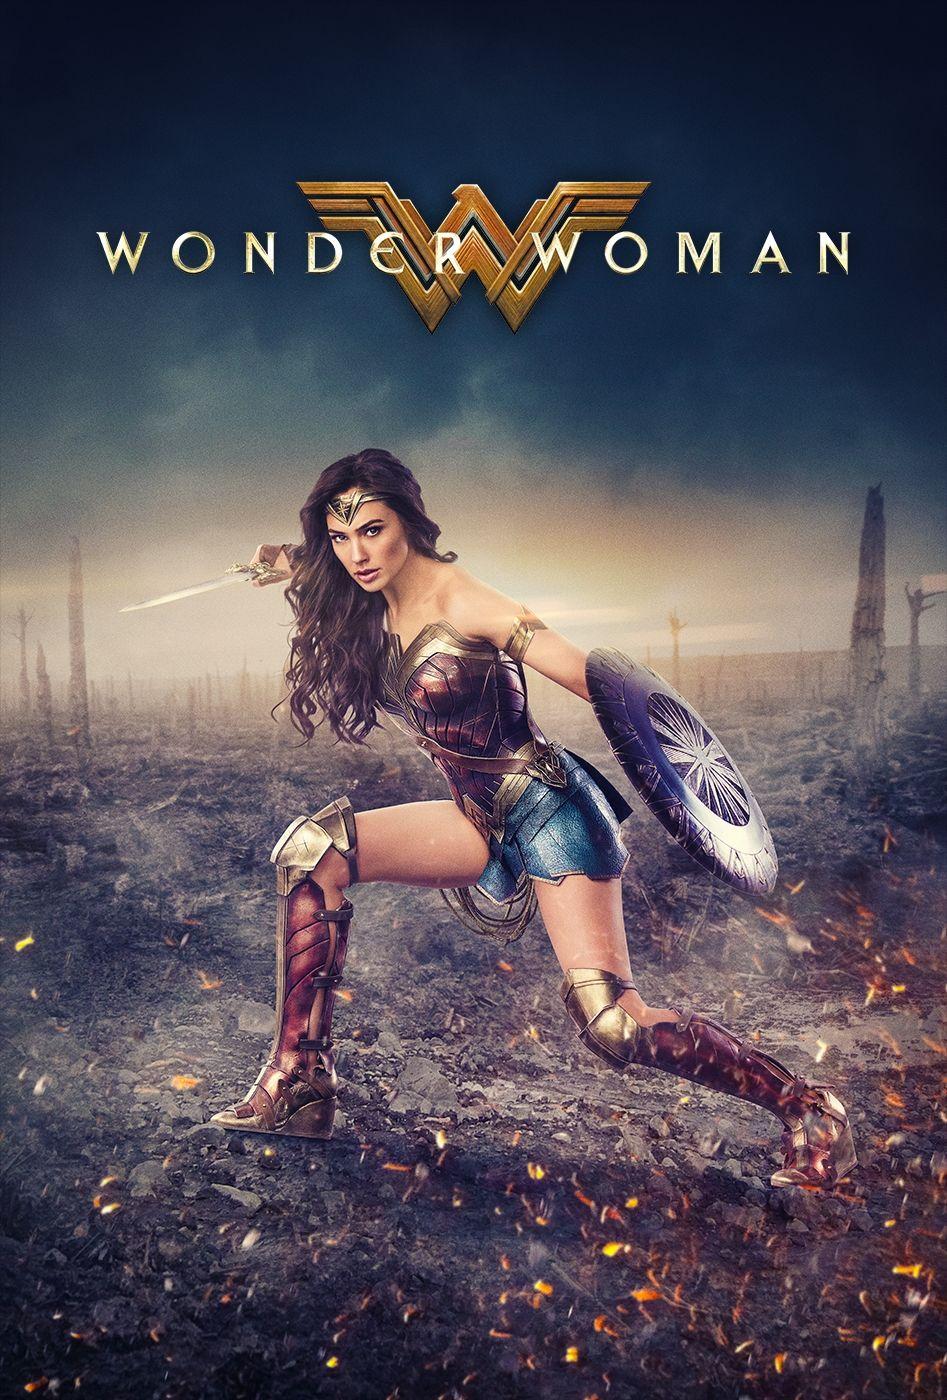 wonder woman movie